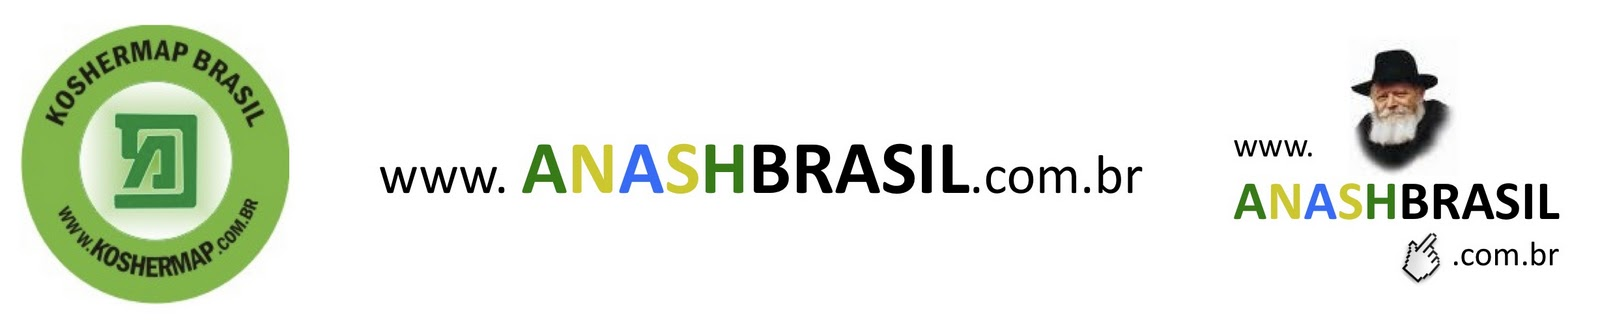 ANASH BRASIL